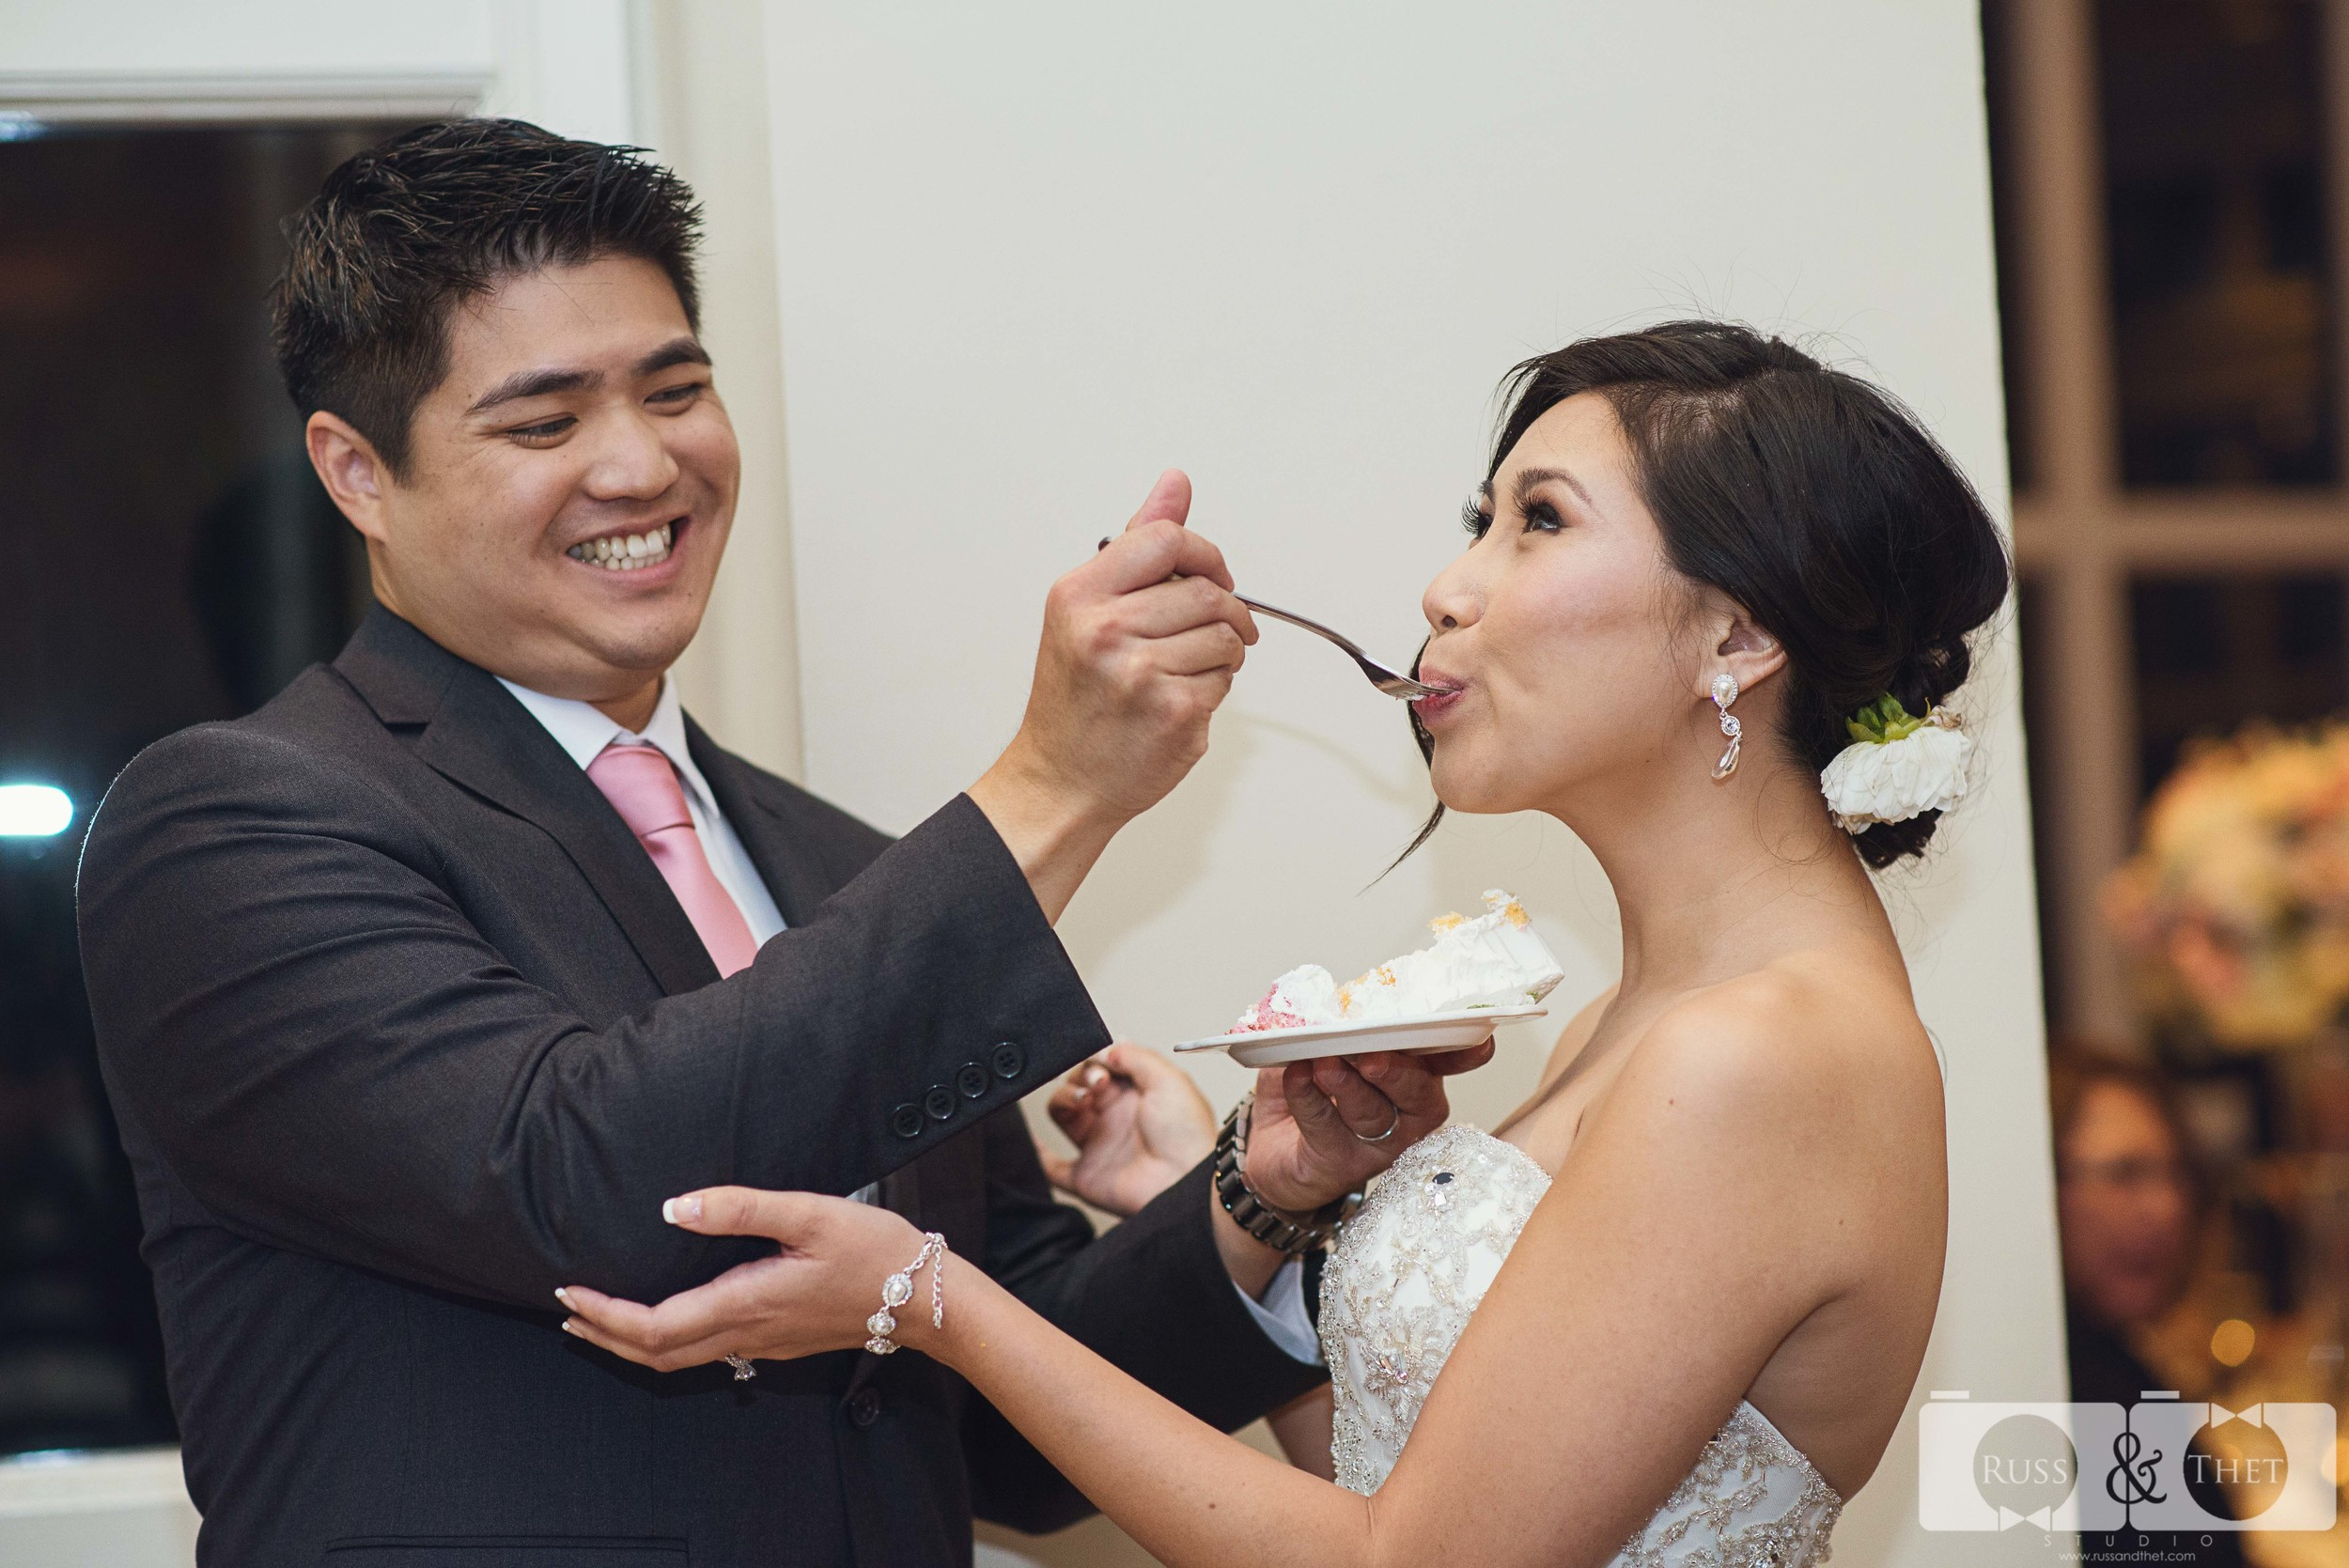 summit-house-fullerton-wedding-photographer-129.JPG